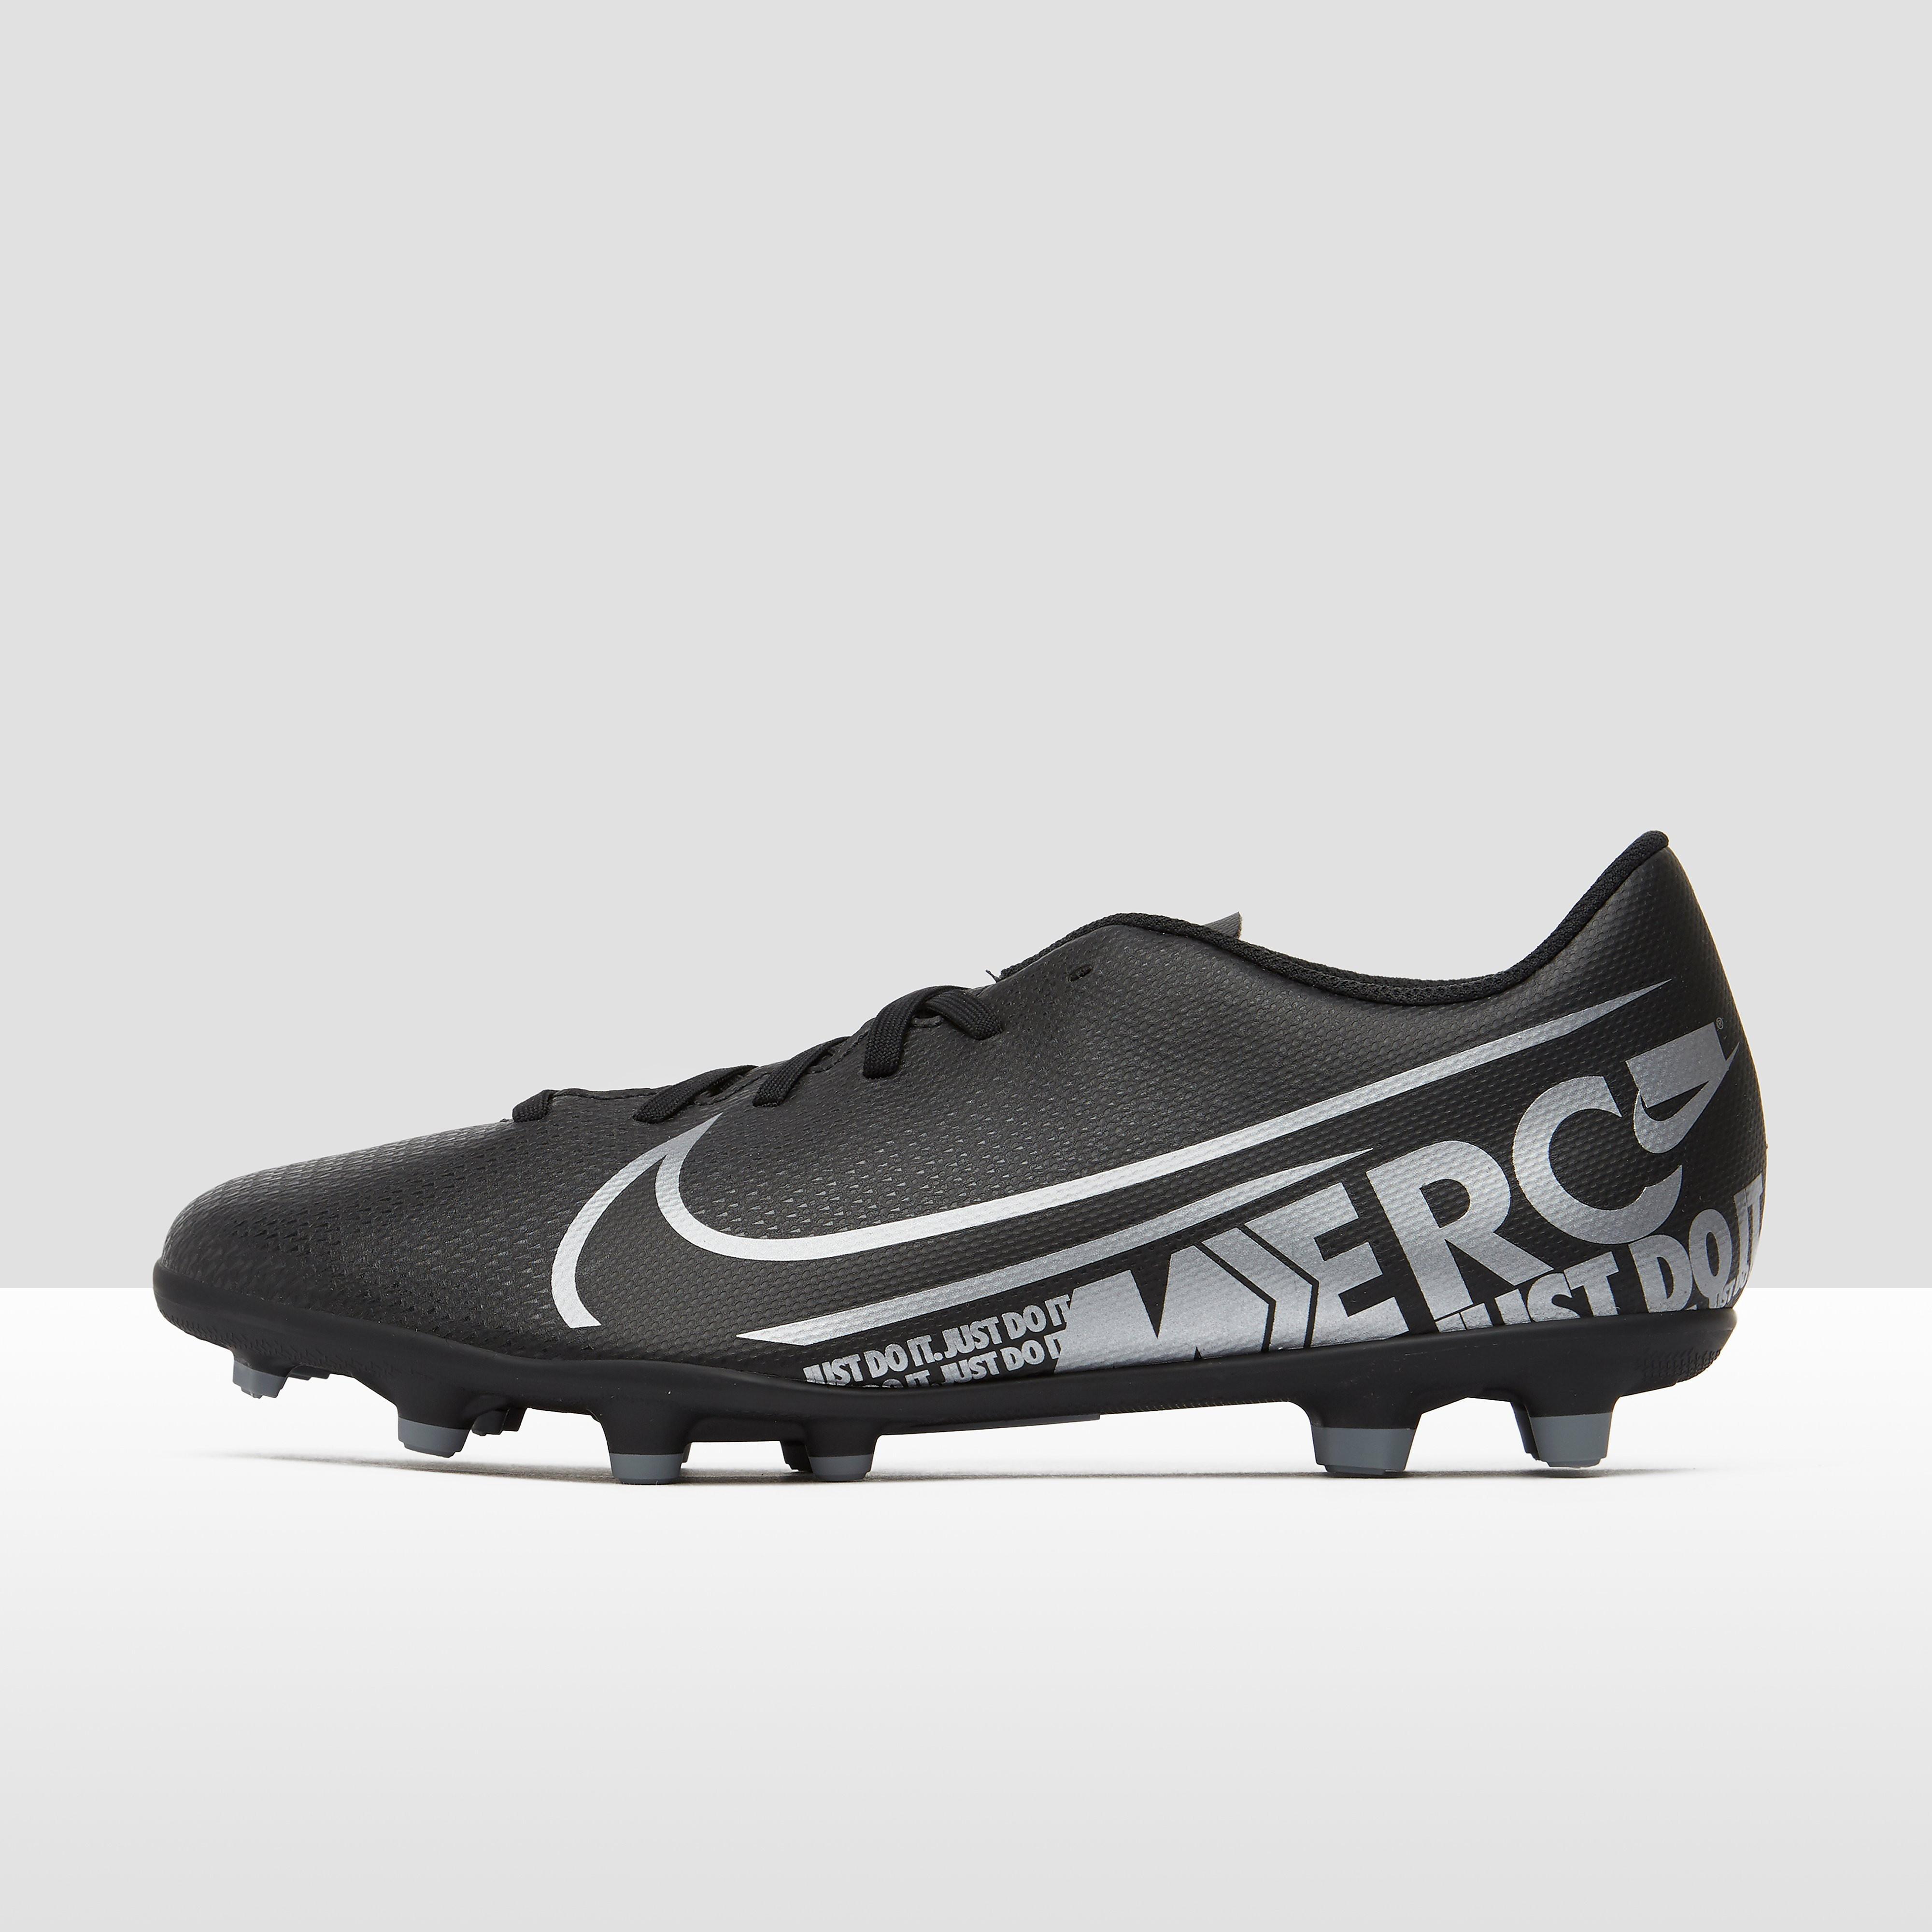 NIKE Mercurial vapor 13 club mg voetbalschoenen zwart Dames